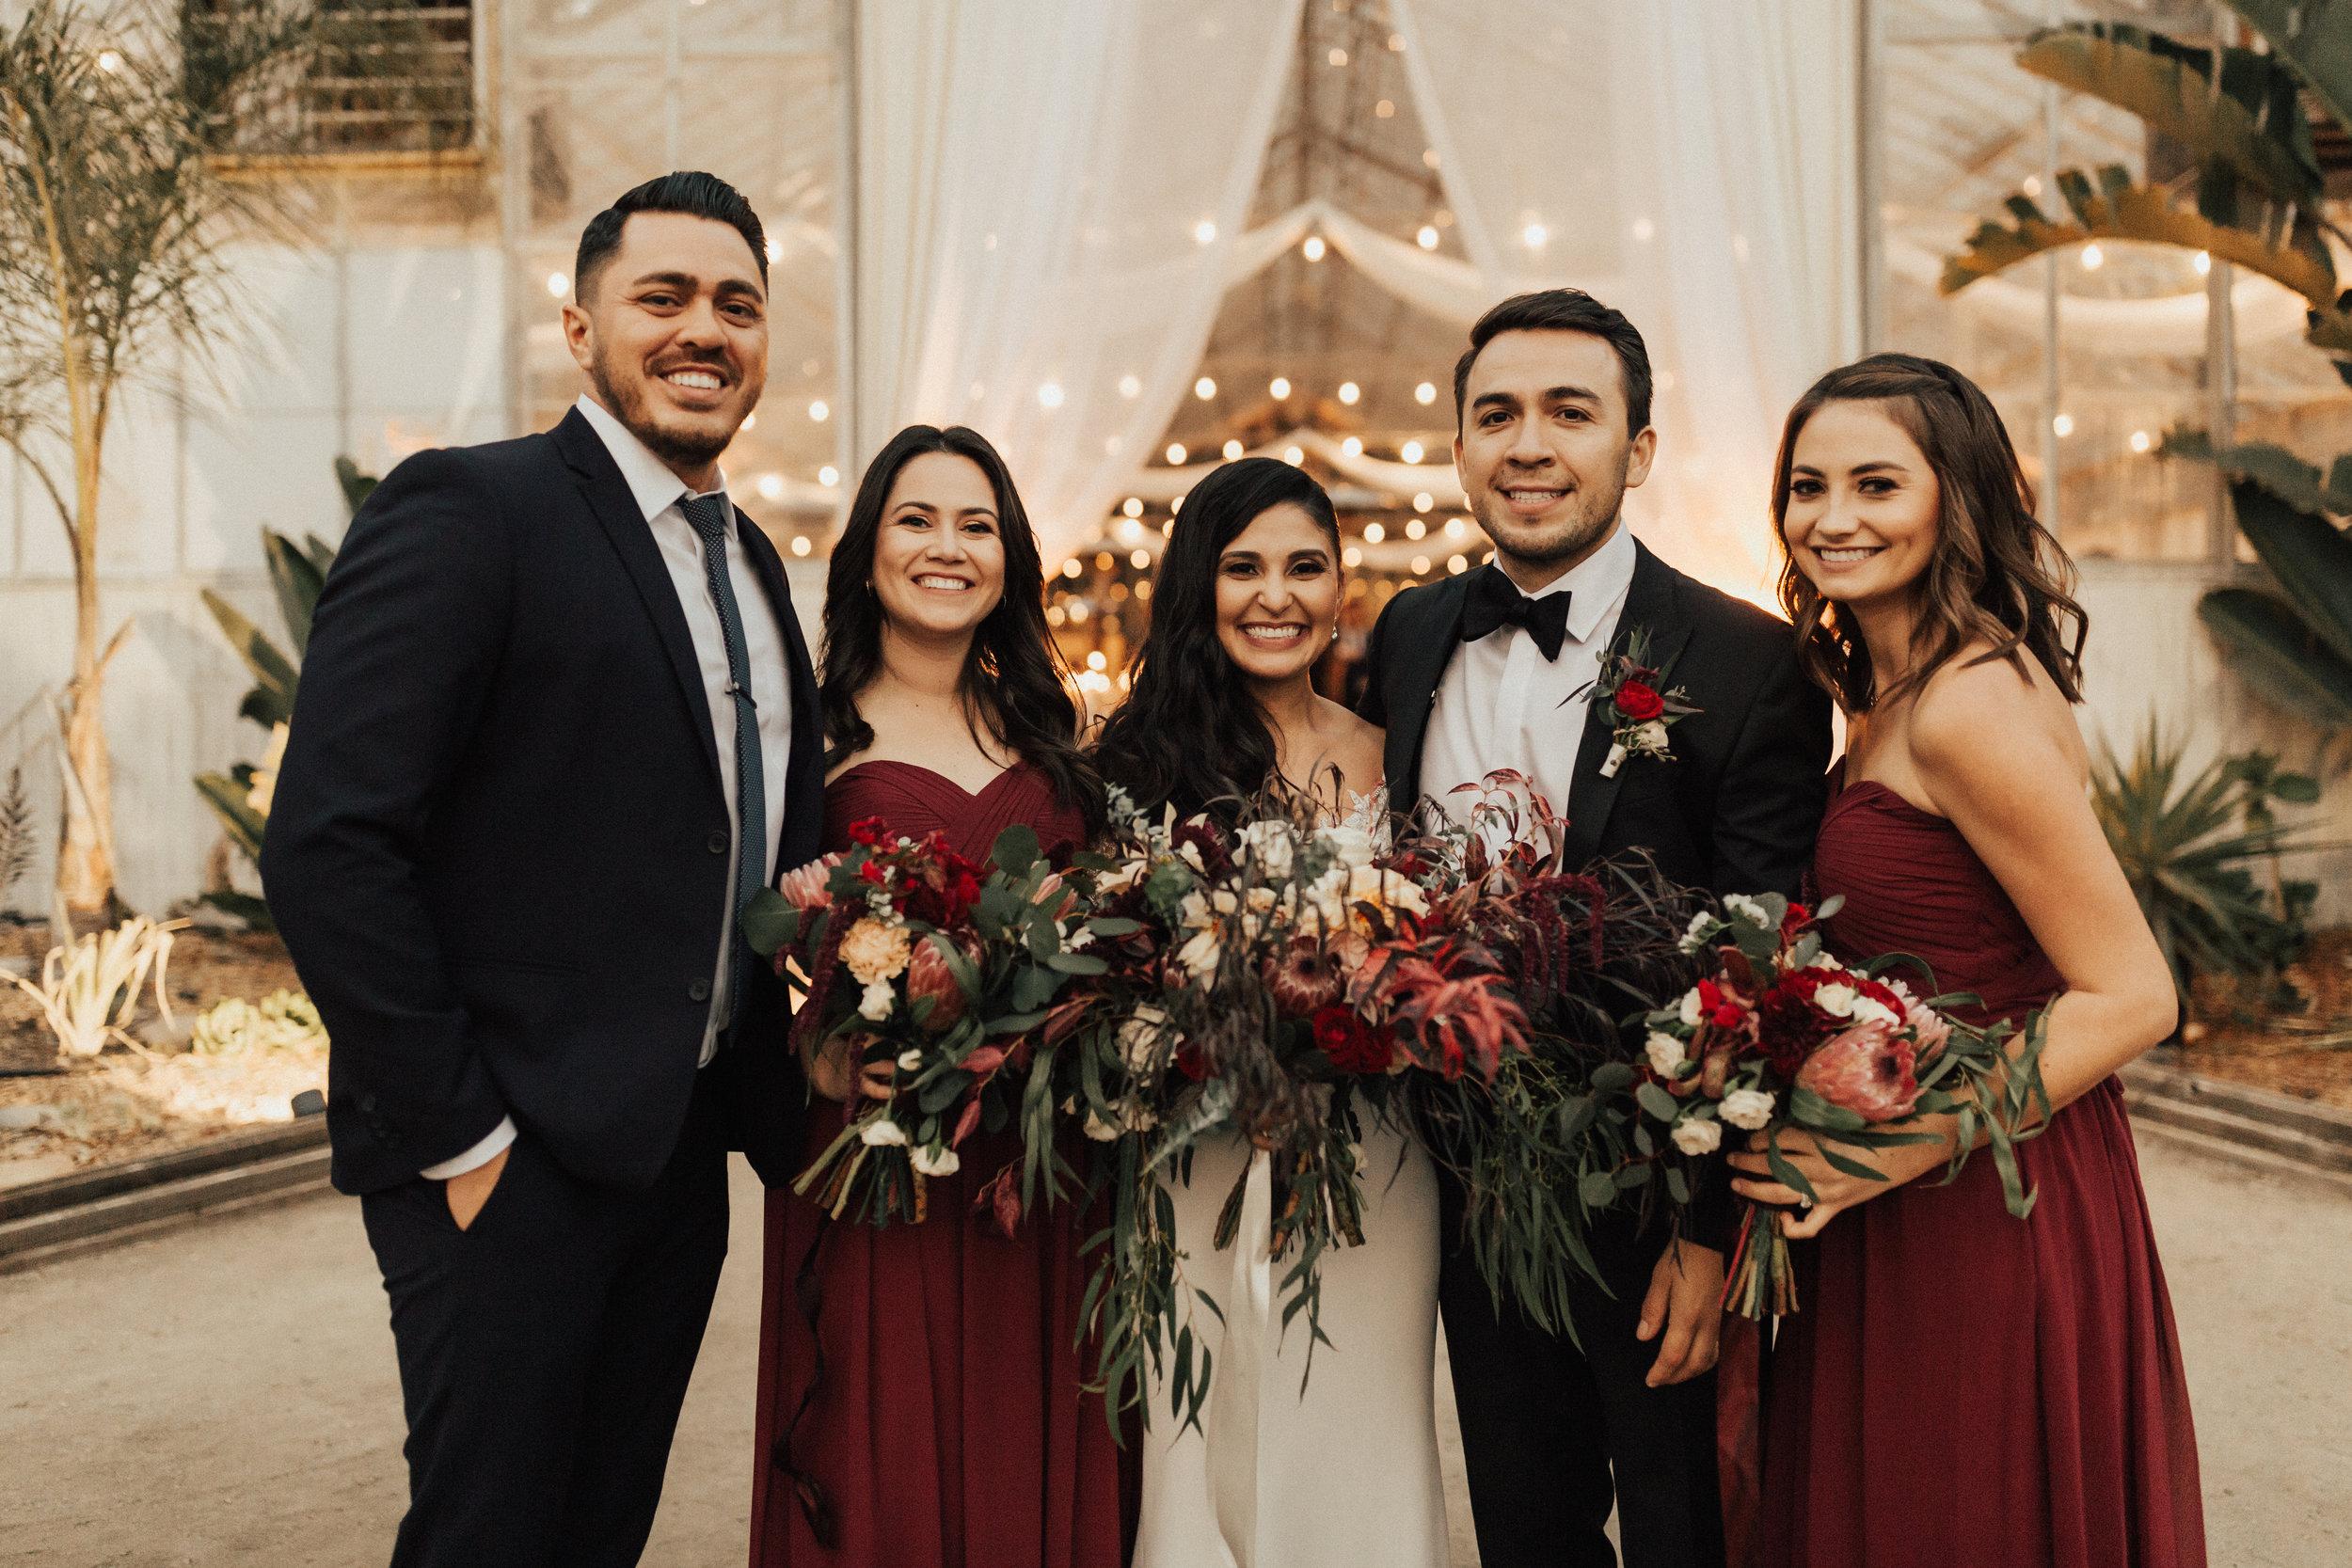 JessicaVictor-SantaBarbara-OrchidFarms-Wedding-720.jpg